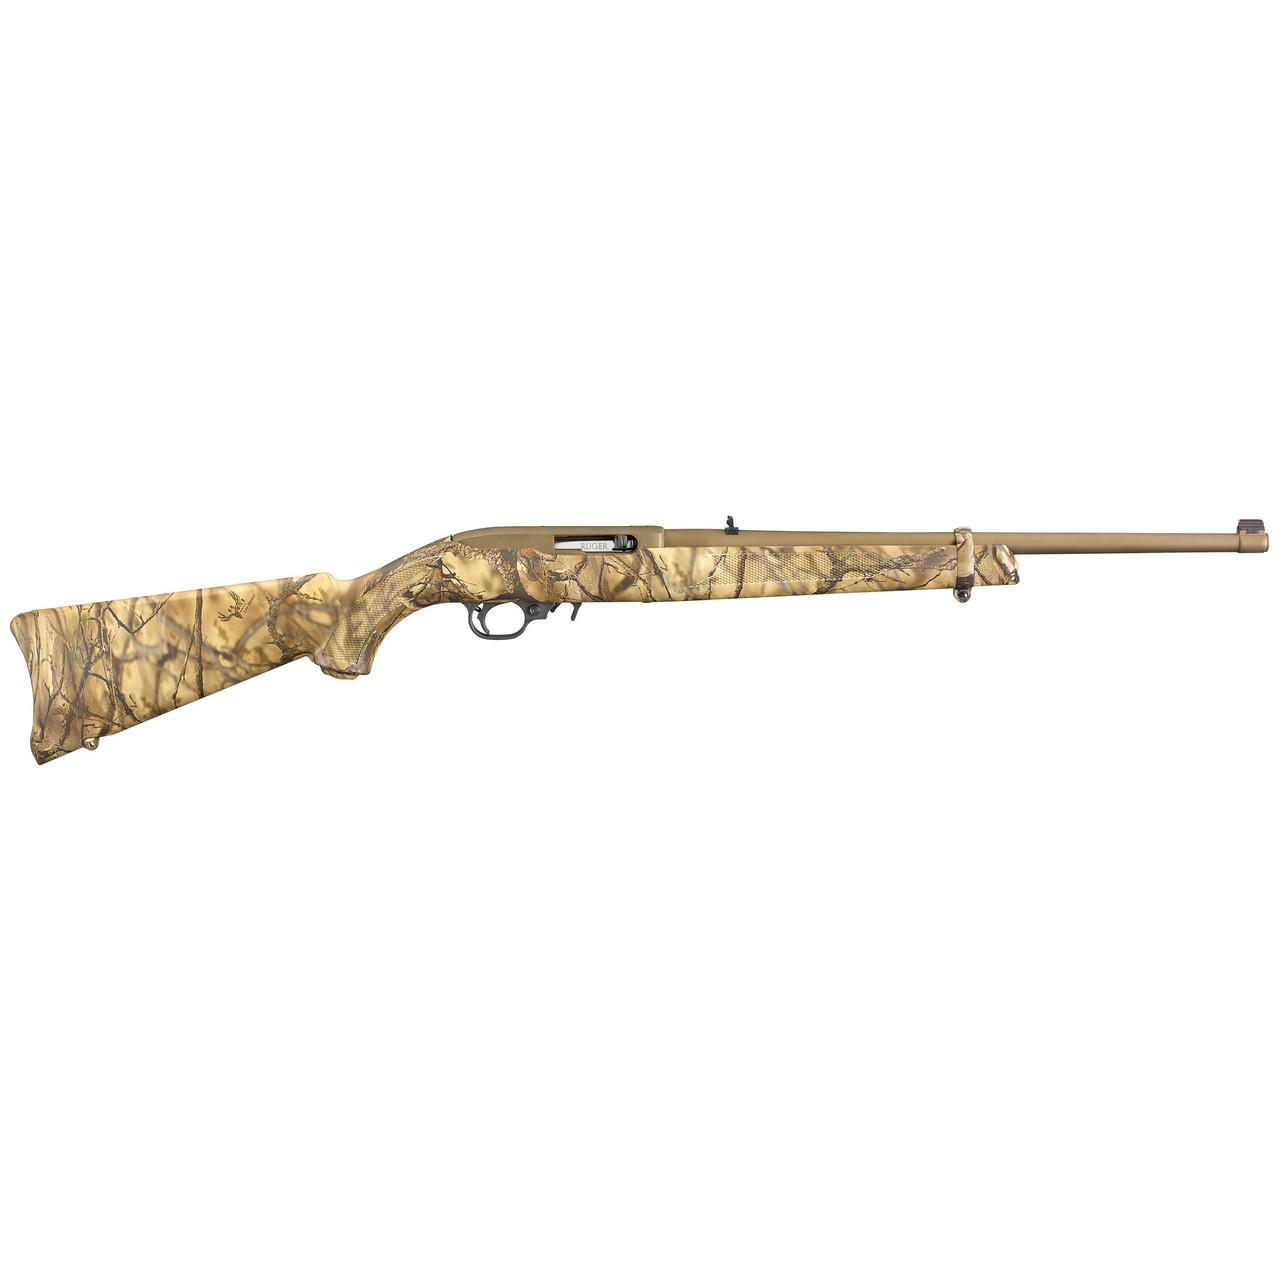 Ruger 10/22 Carbine Talo Exclusive CALIFORNIA LEGAL - .22LR - GO Wild Camo